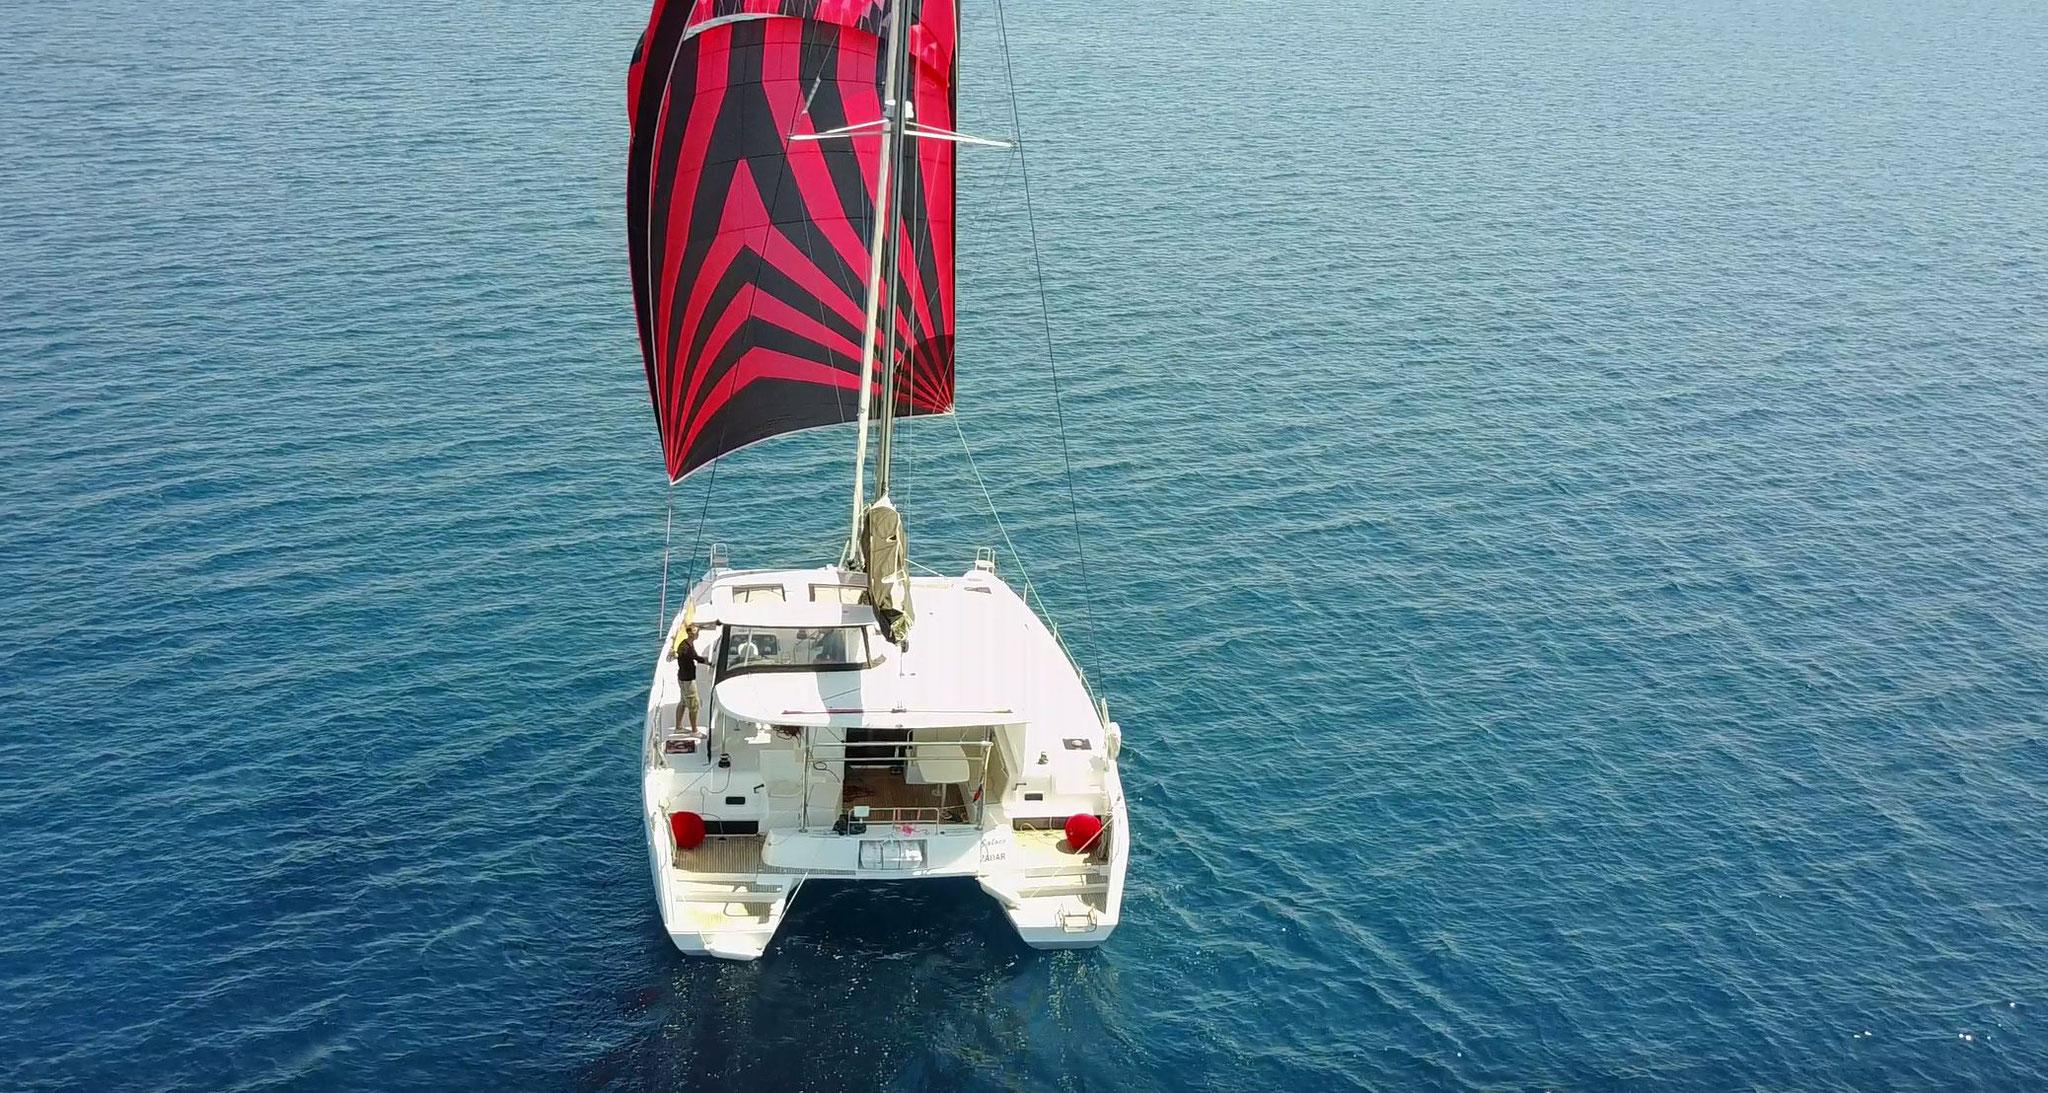 Karamaran fahren mit Lagoon 42 - Janny in Kroatien      -       www.katamarantraum.com